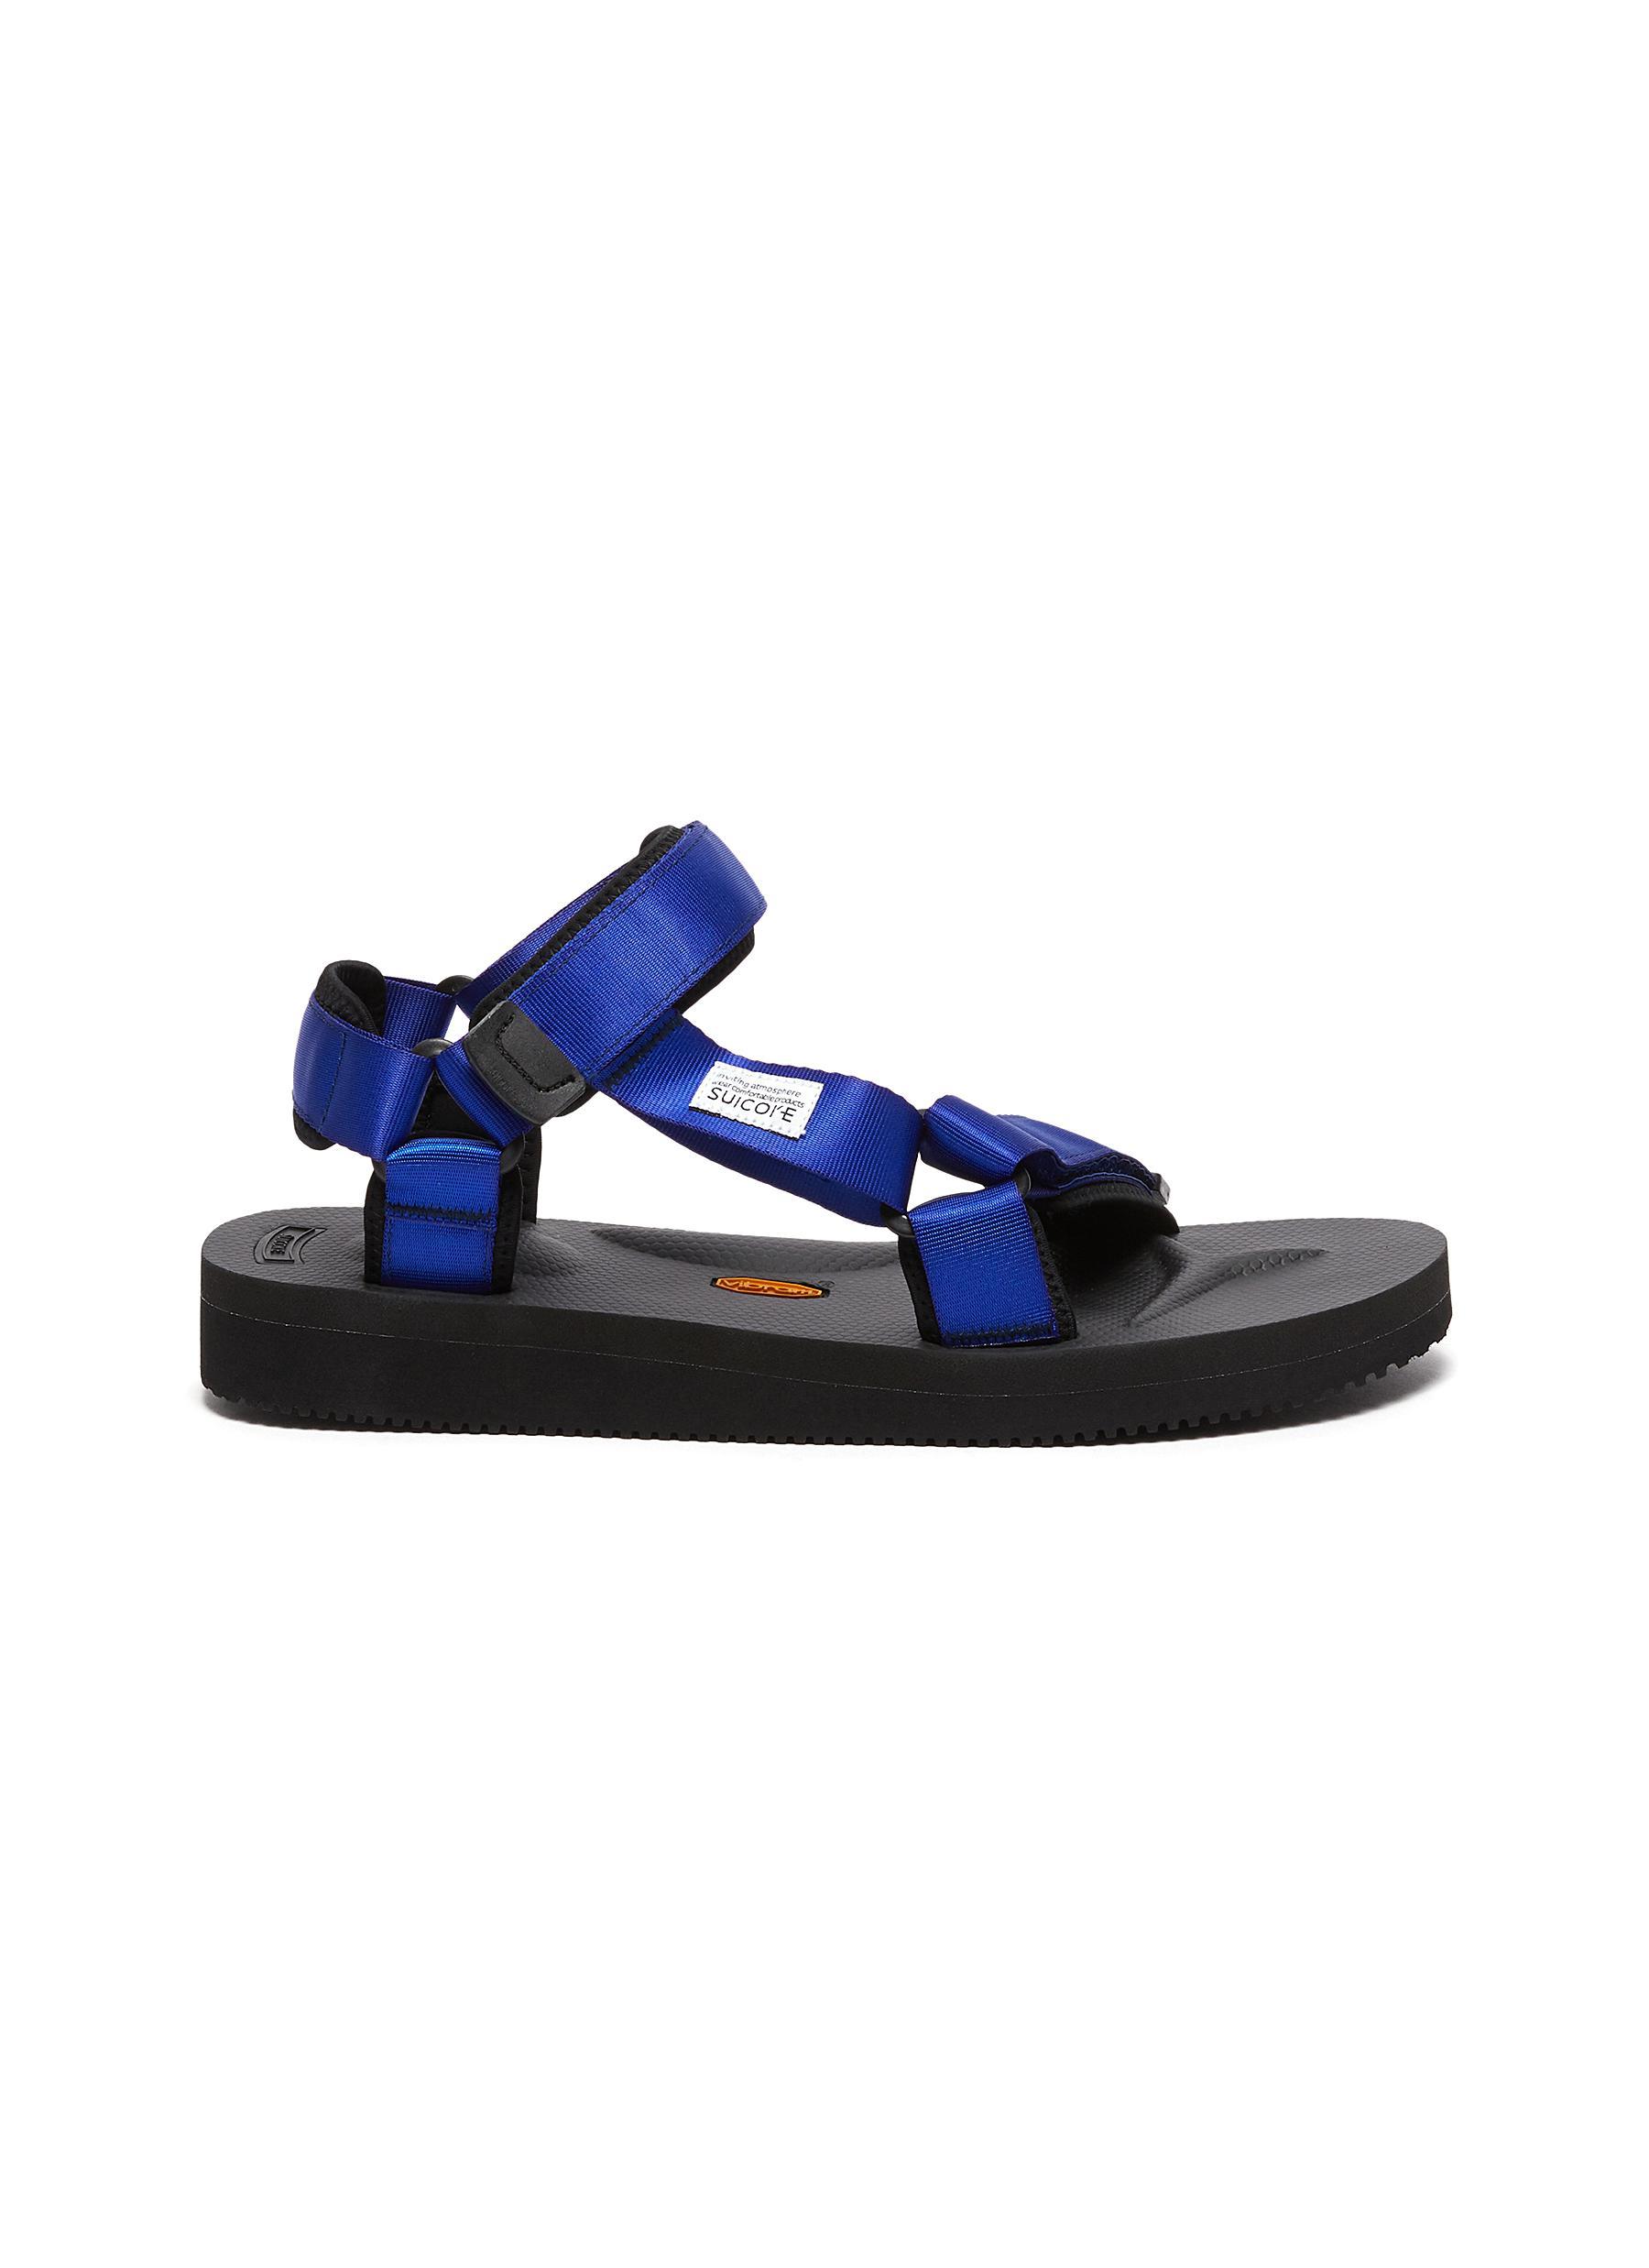 Assymetrical Sandal - SUICOKE - Modalova